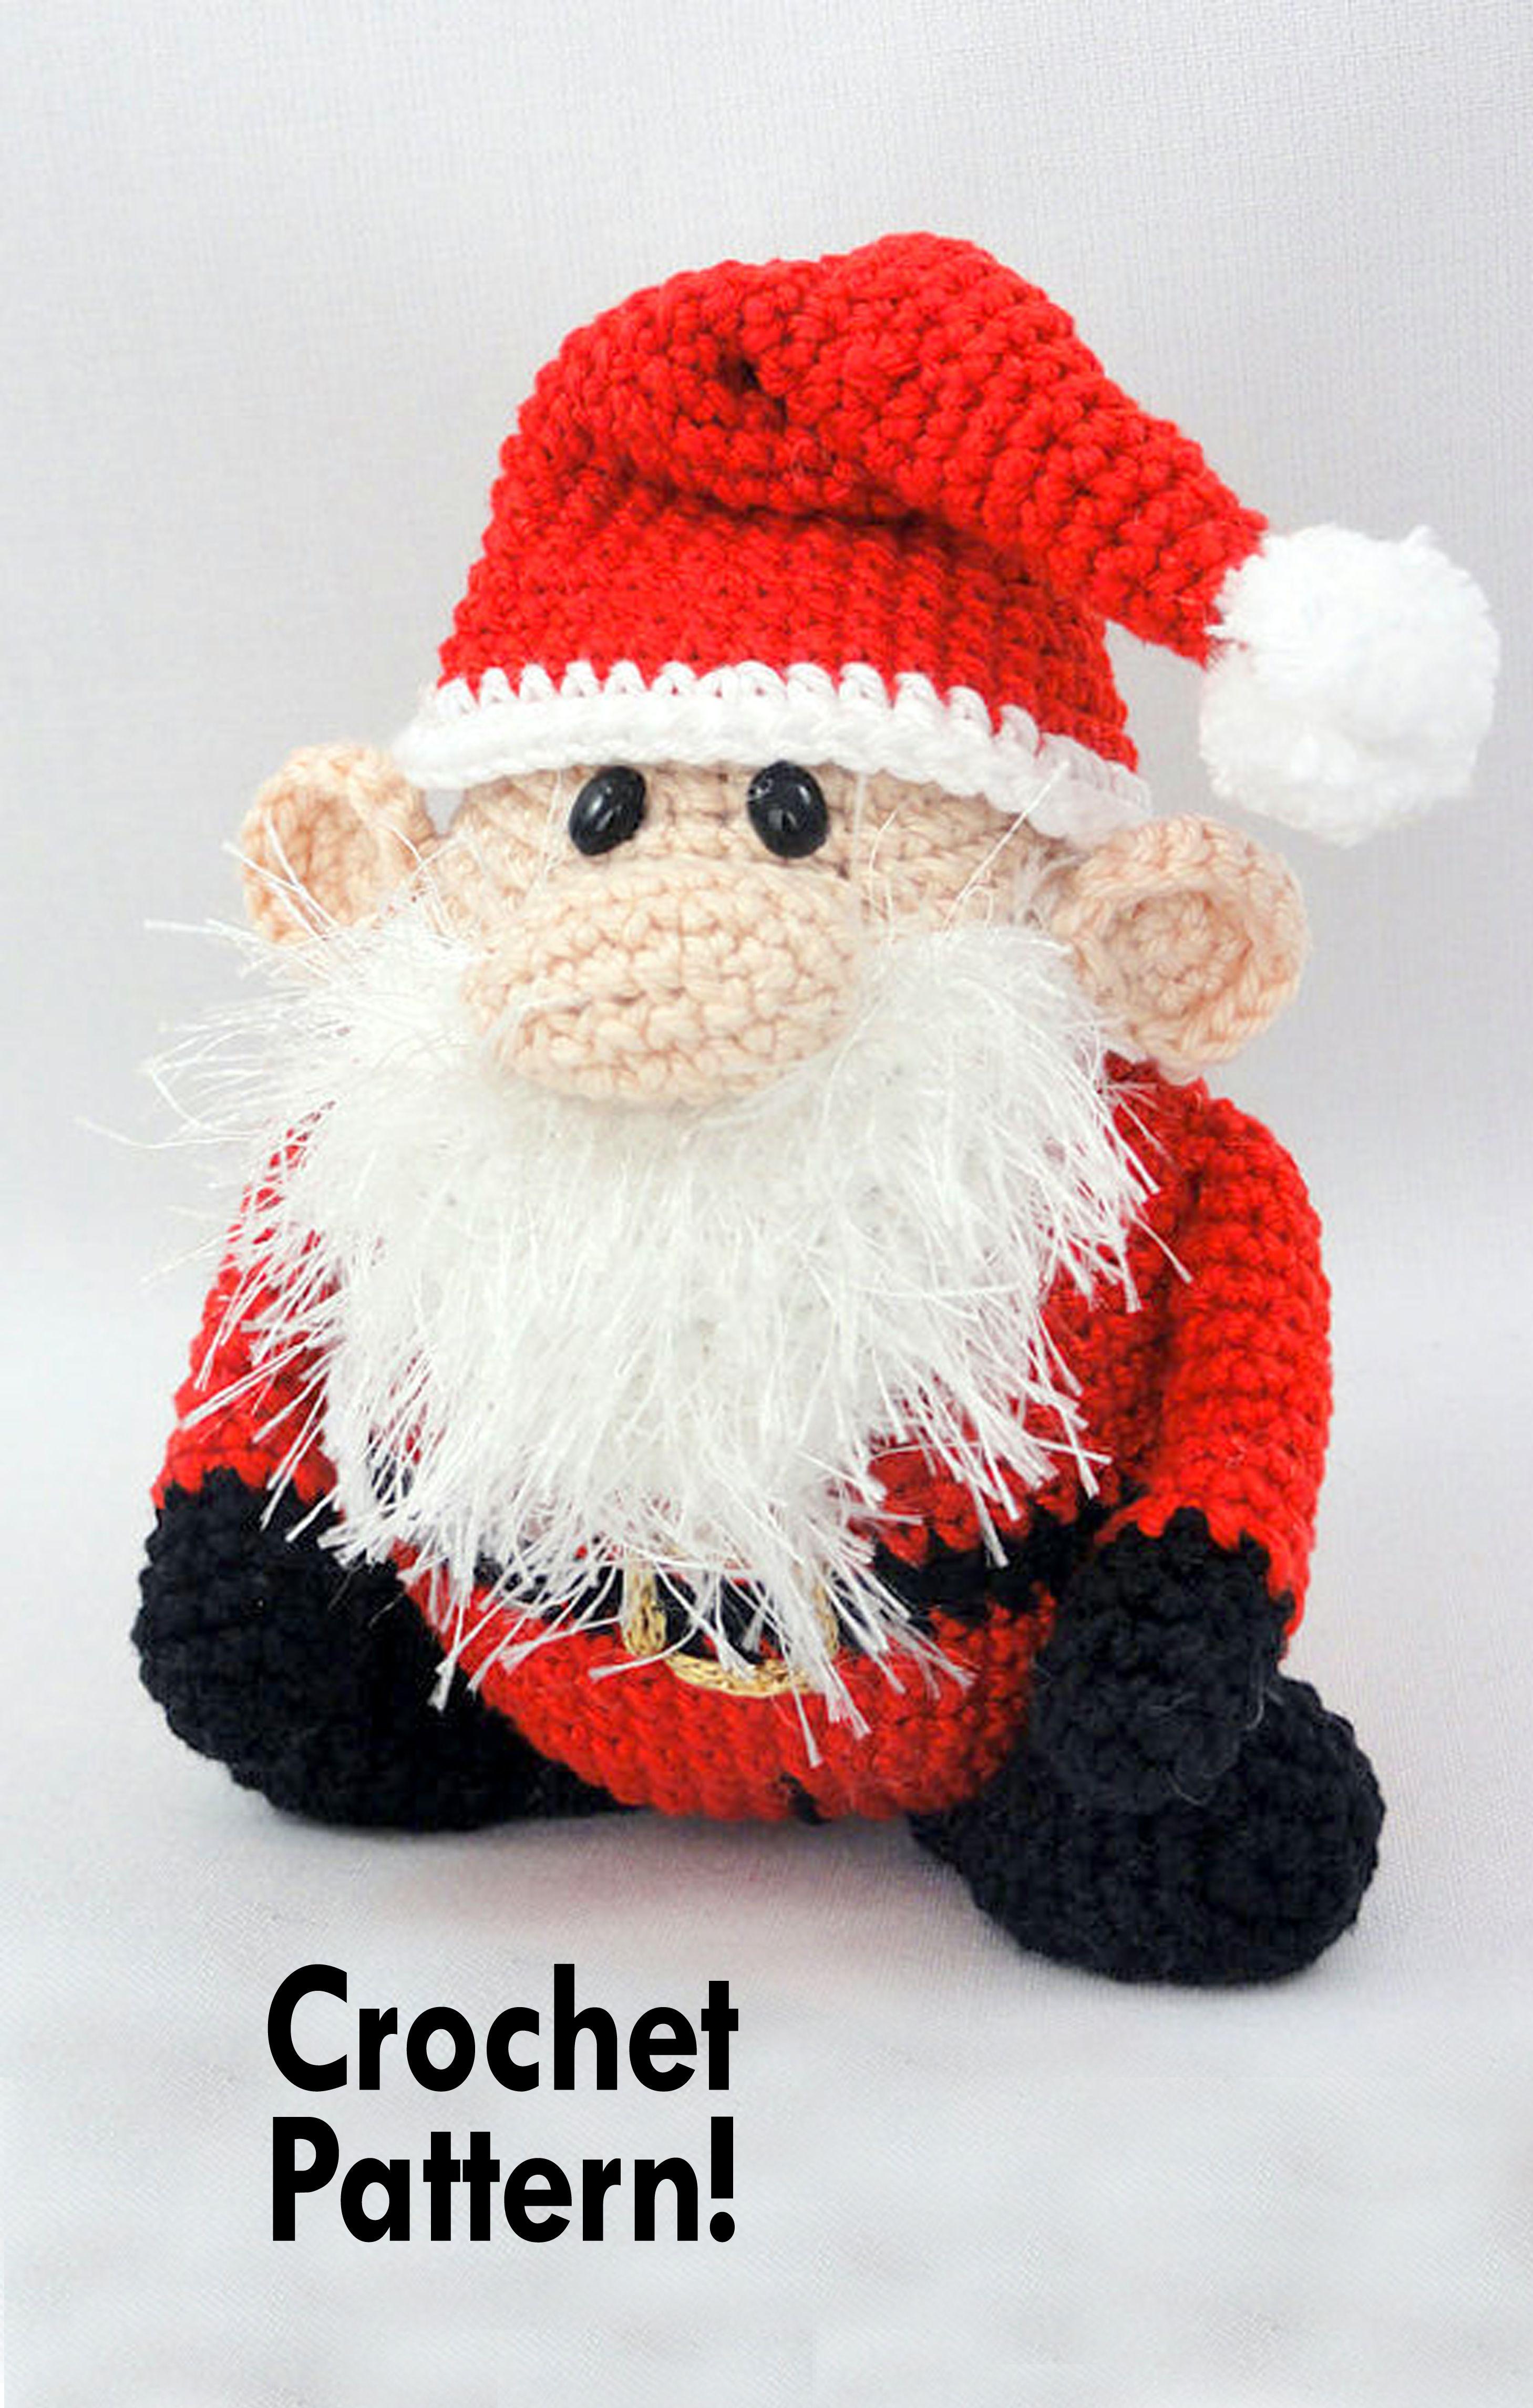 Amigurumi Crochet Pattern - Santa Claus - XS Edition - English ...